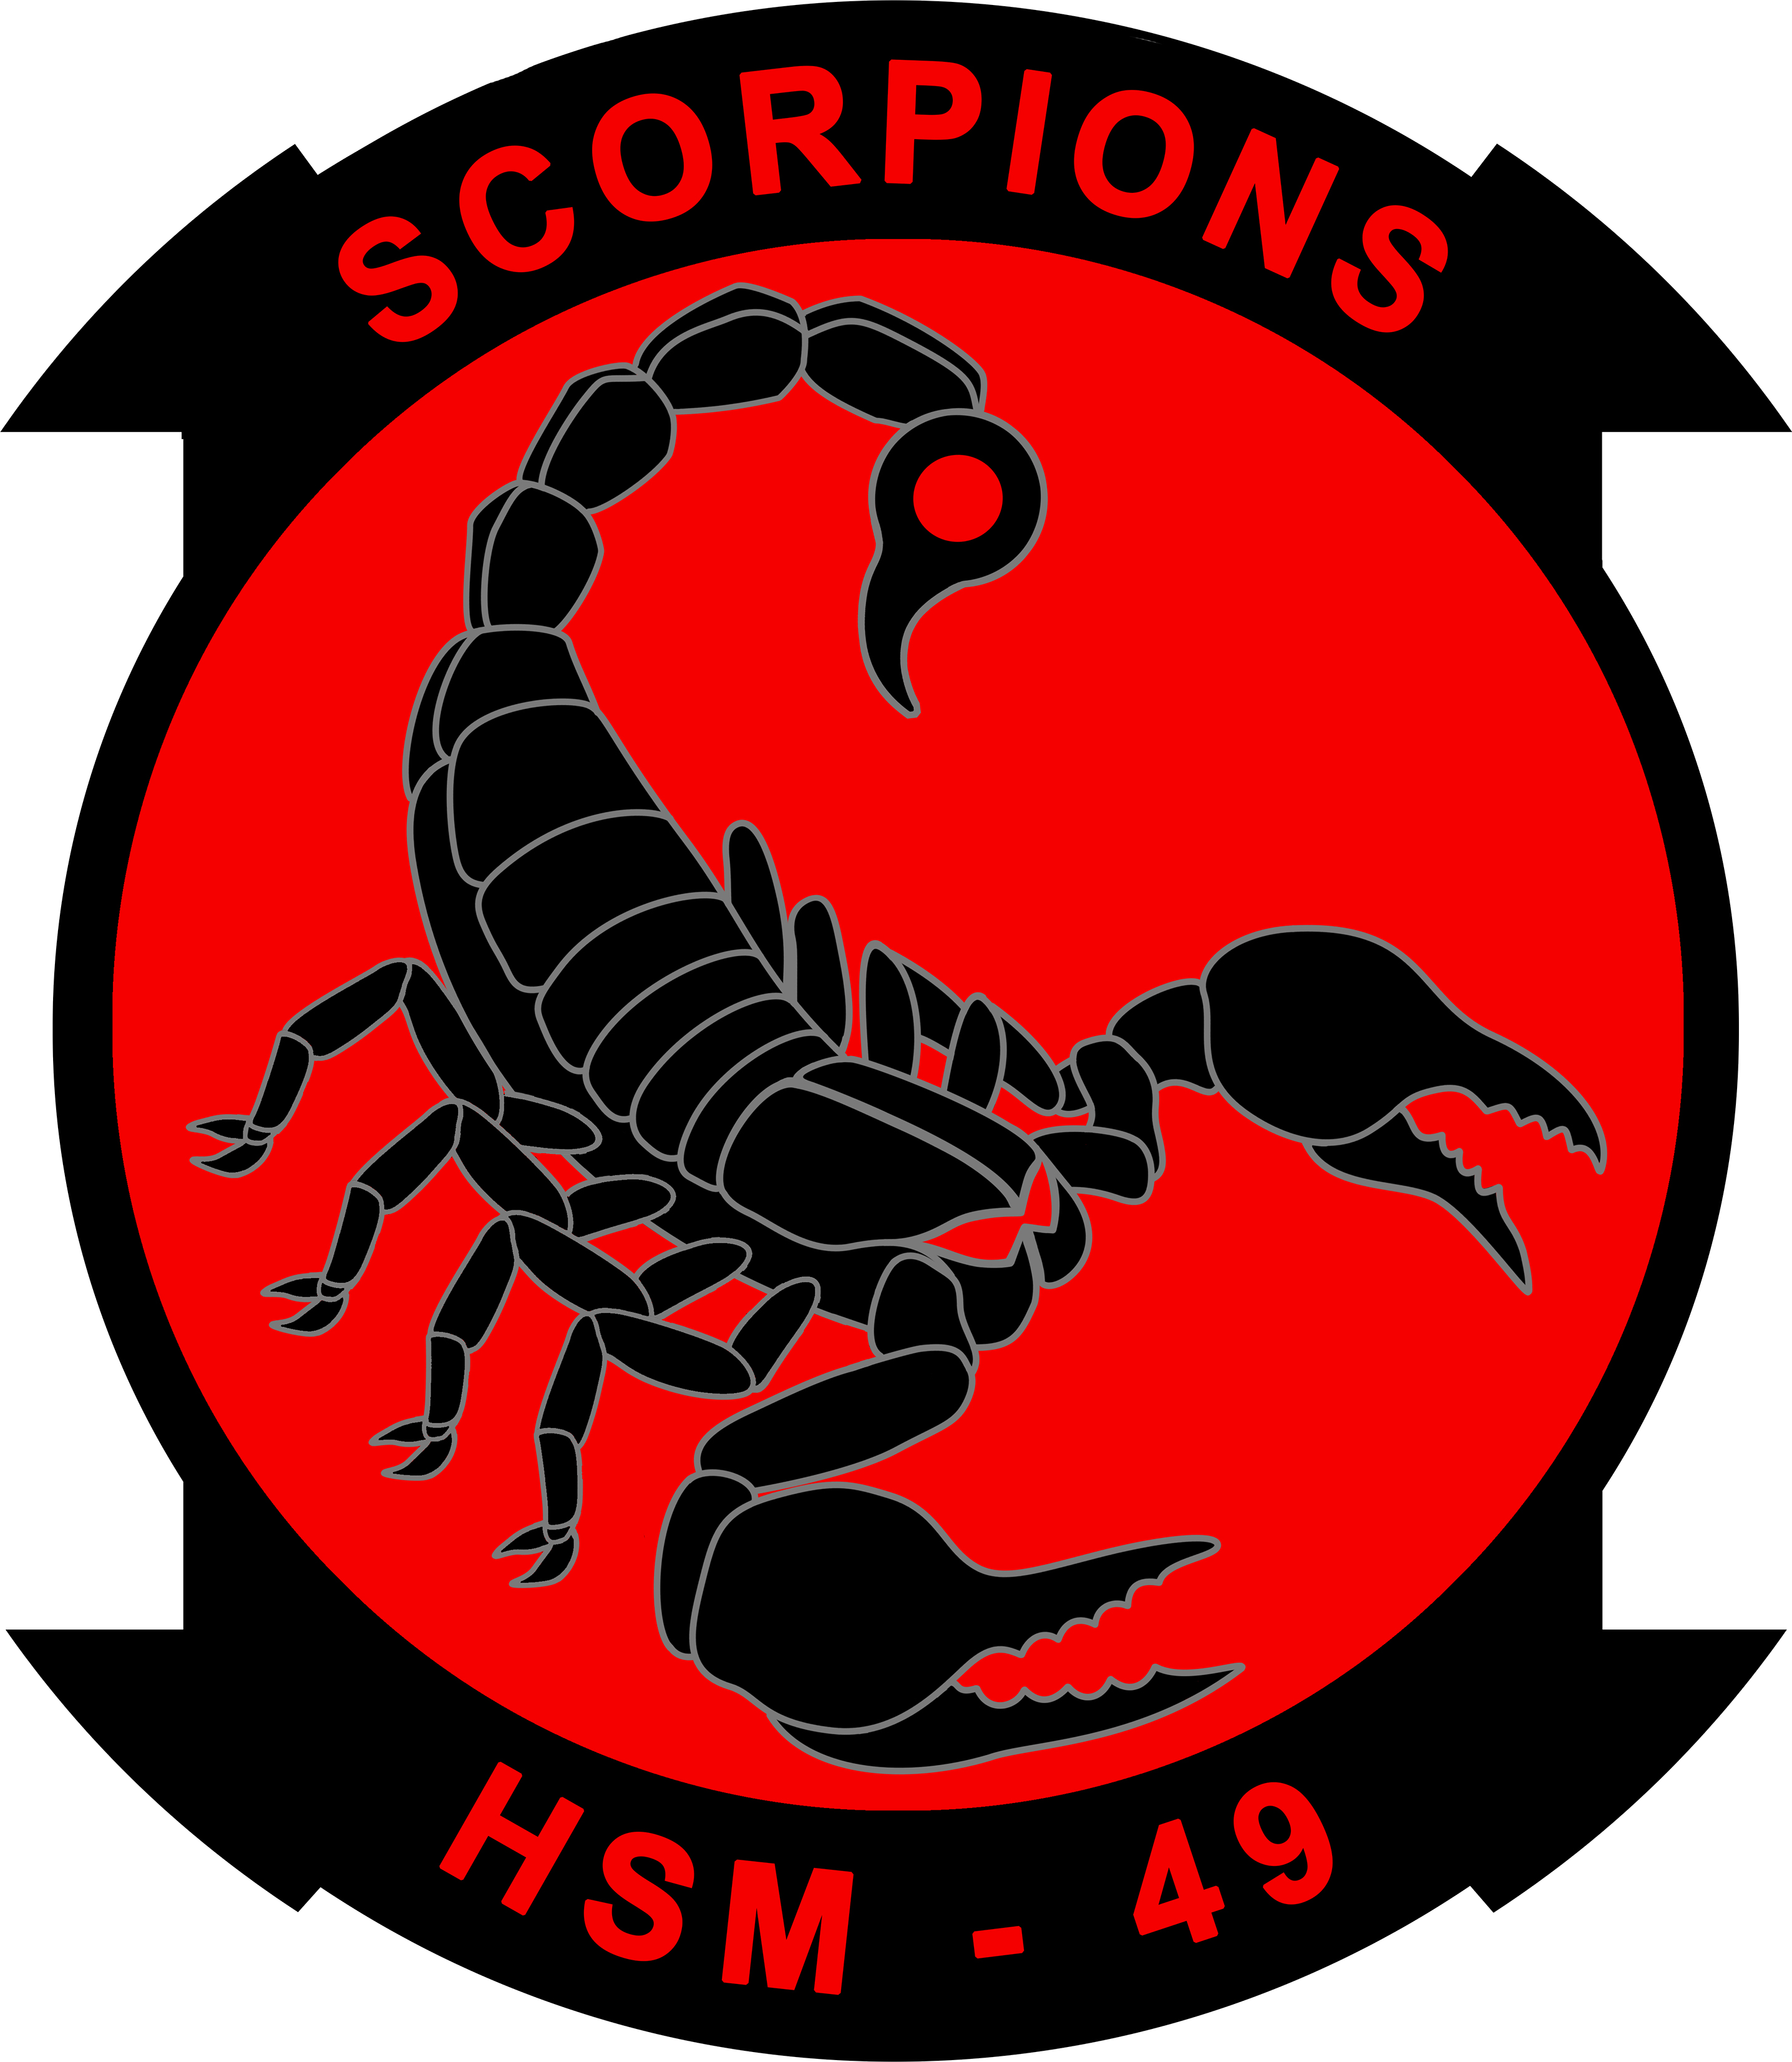 Filehelicopter maritime strike squadron 49 us navy insignia filehelicopter maritime strike squadron 49 us navy insignia 2016g biocorpaavc